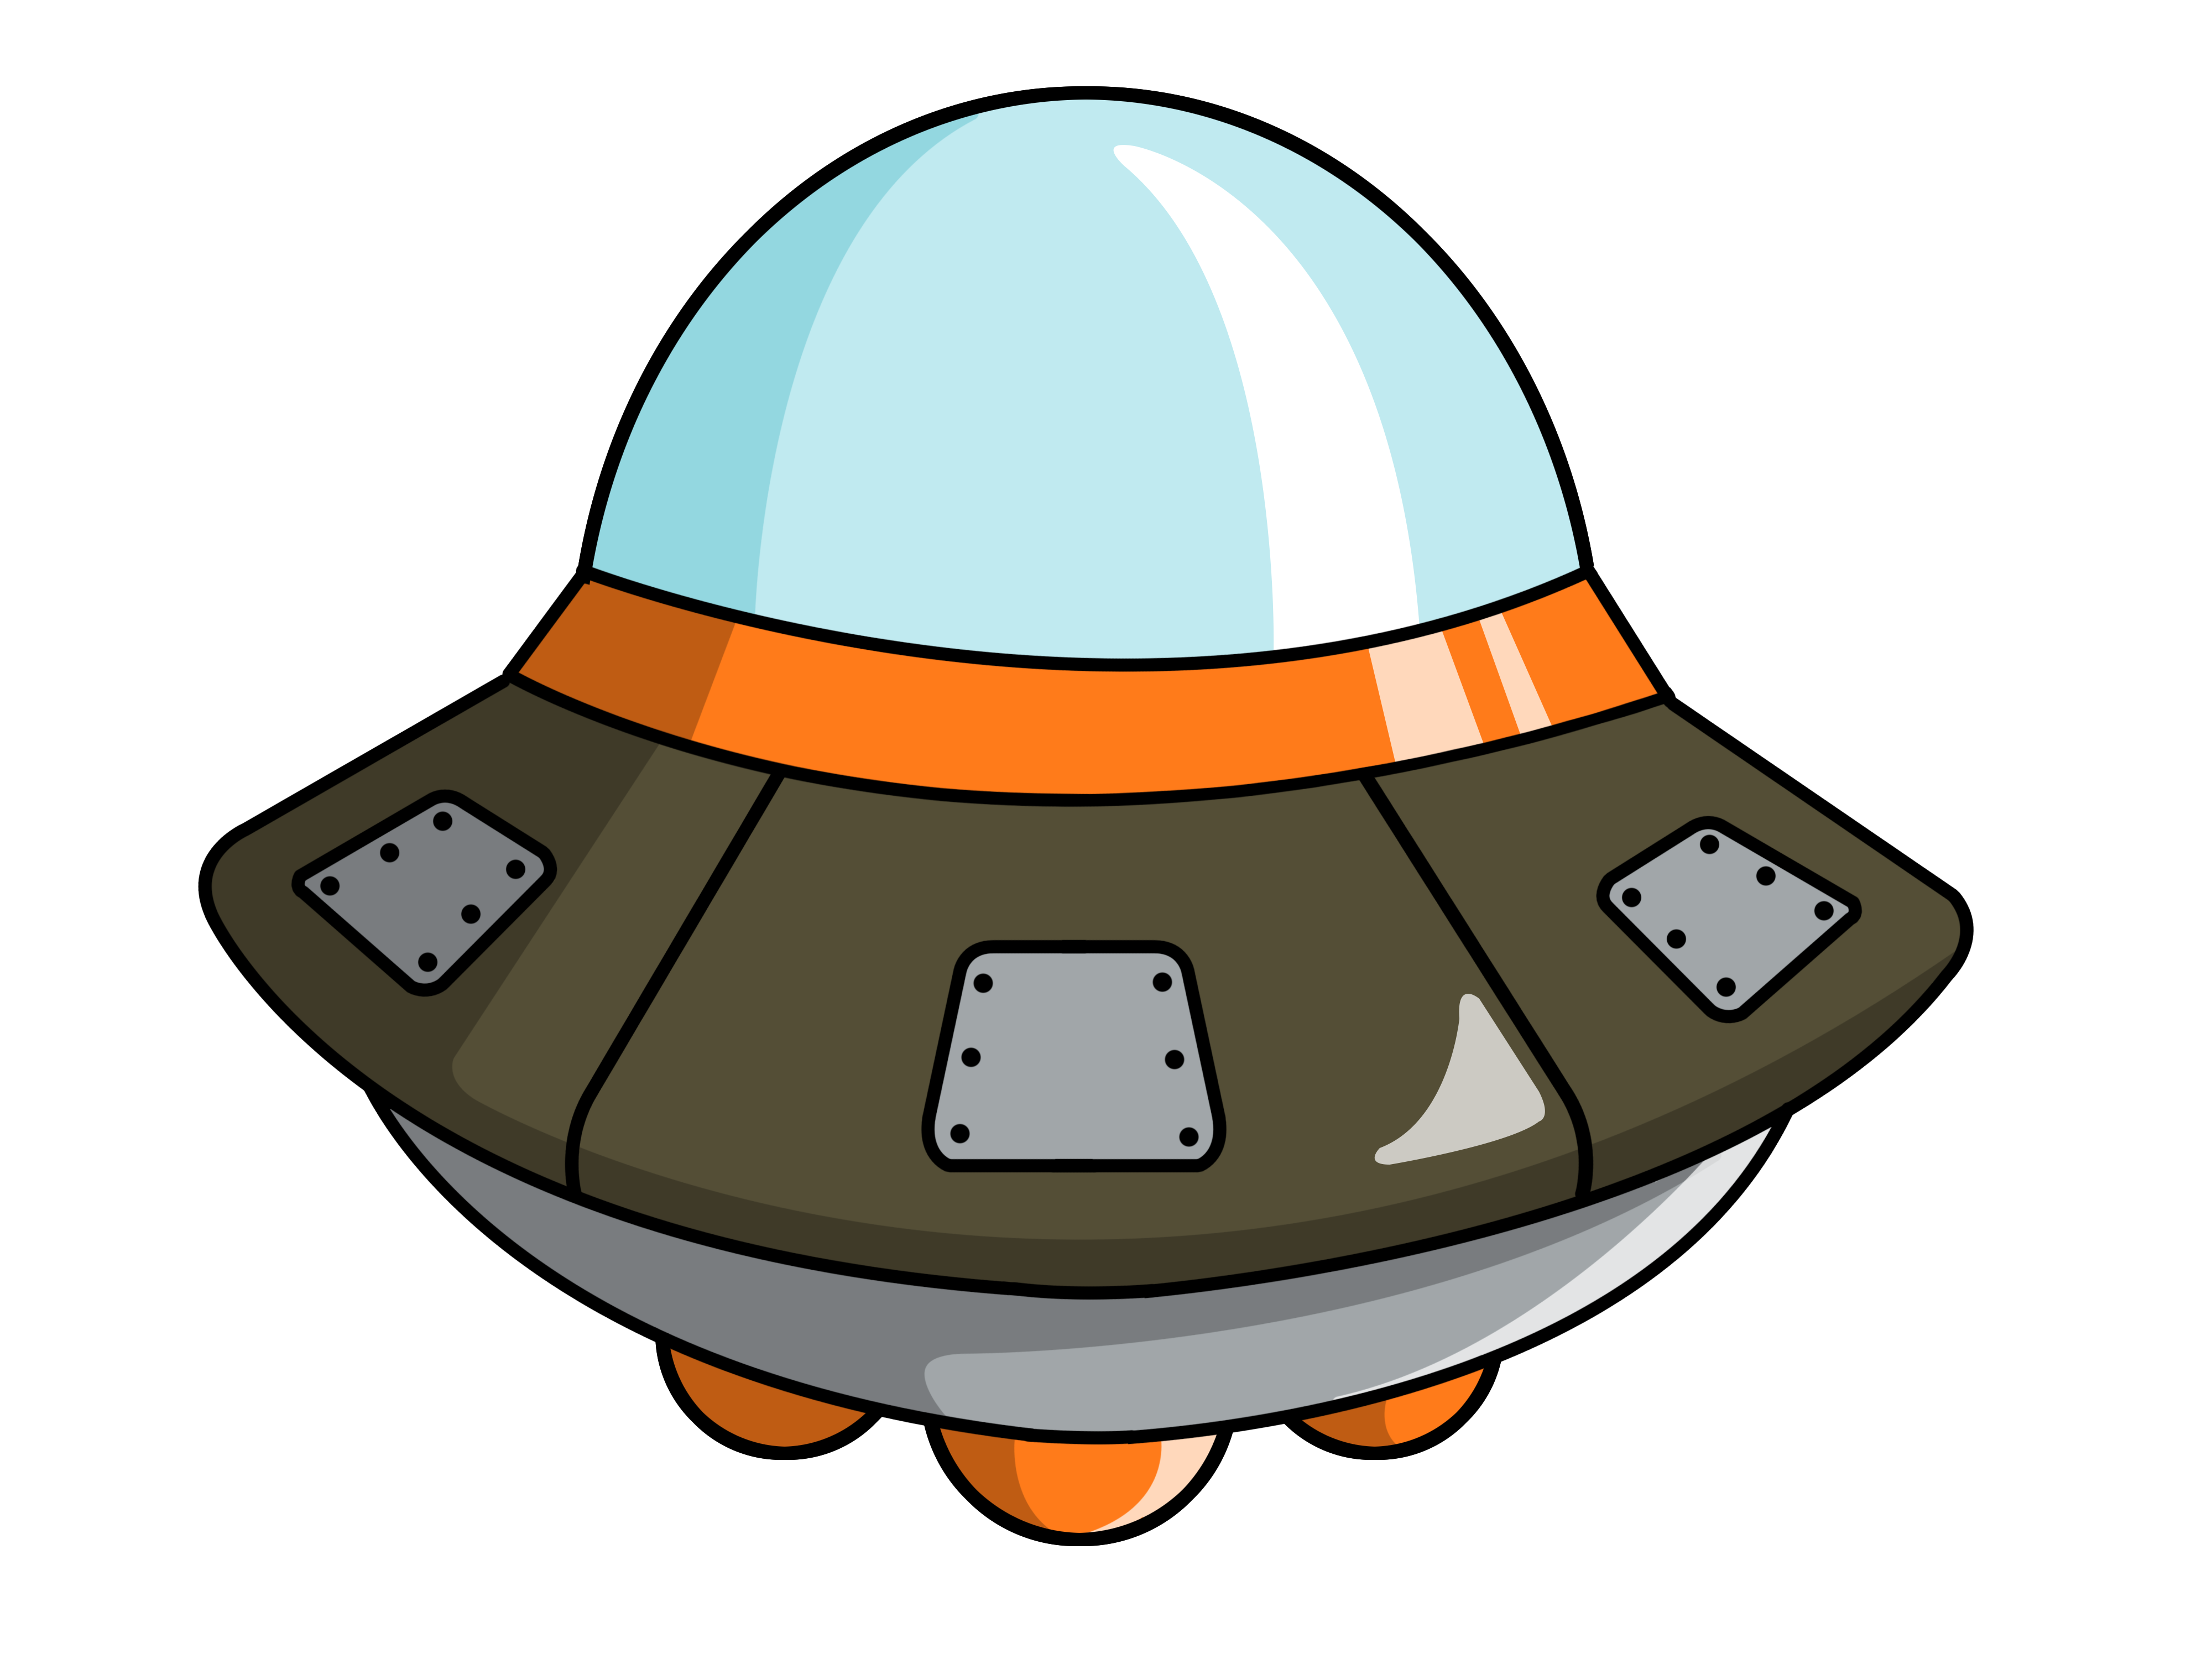 animated spaceship clipart best Spaceship Free Clipartdownlaod Cute Space Clip Art